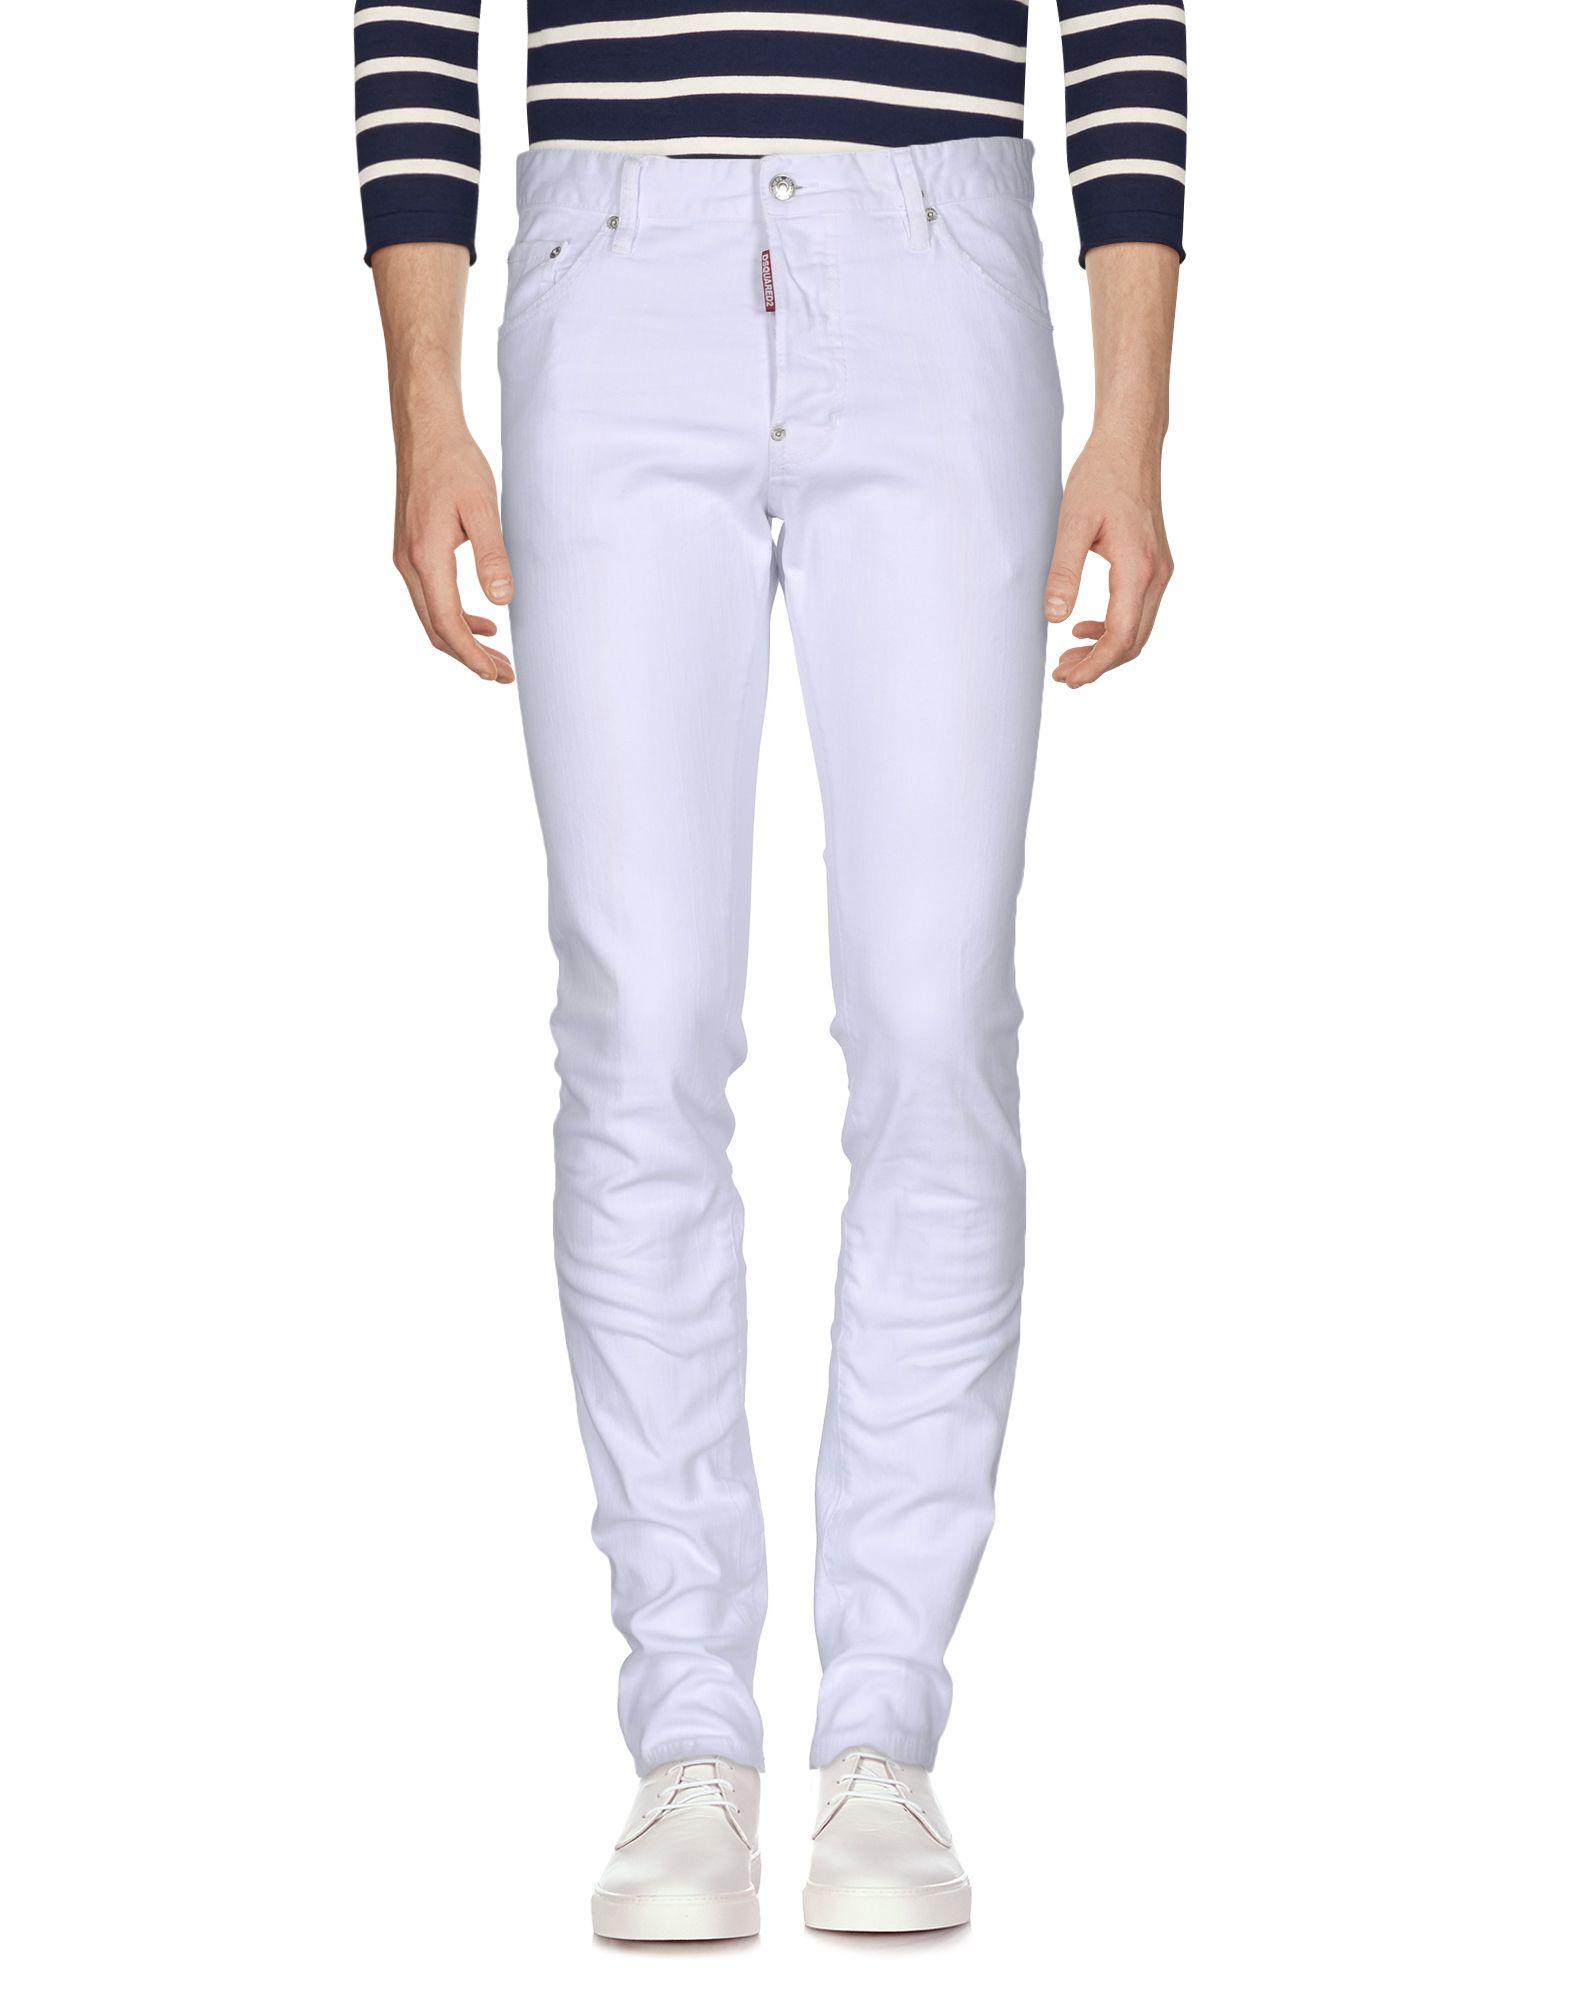 Pantaloni Jeans Dsquared2 Uomo - Acquista online su YOOX - 42556974SL a2439d7afb4f